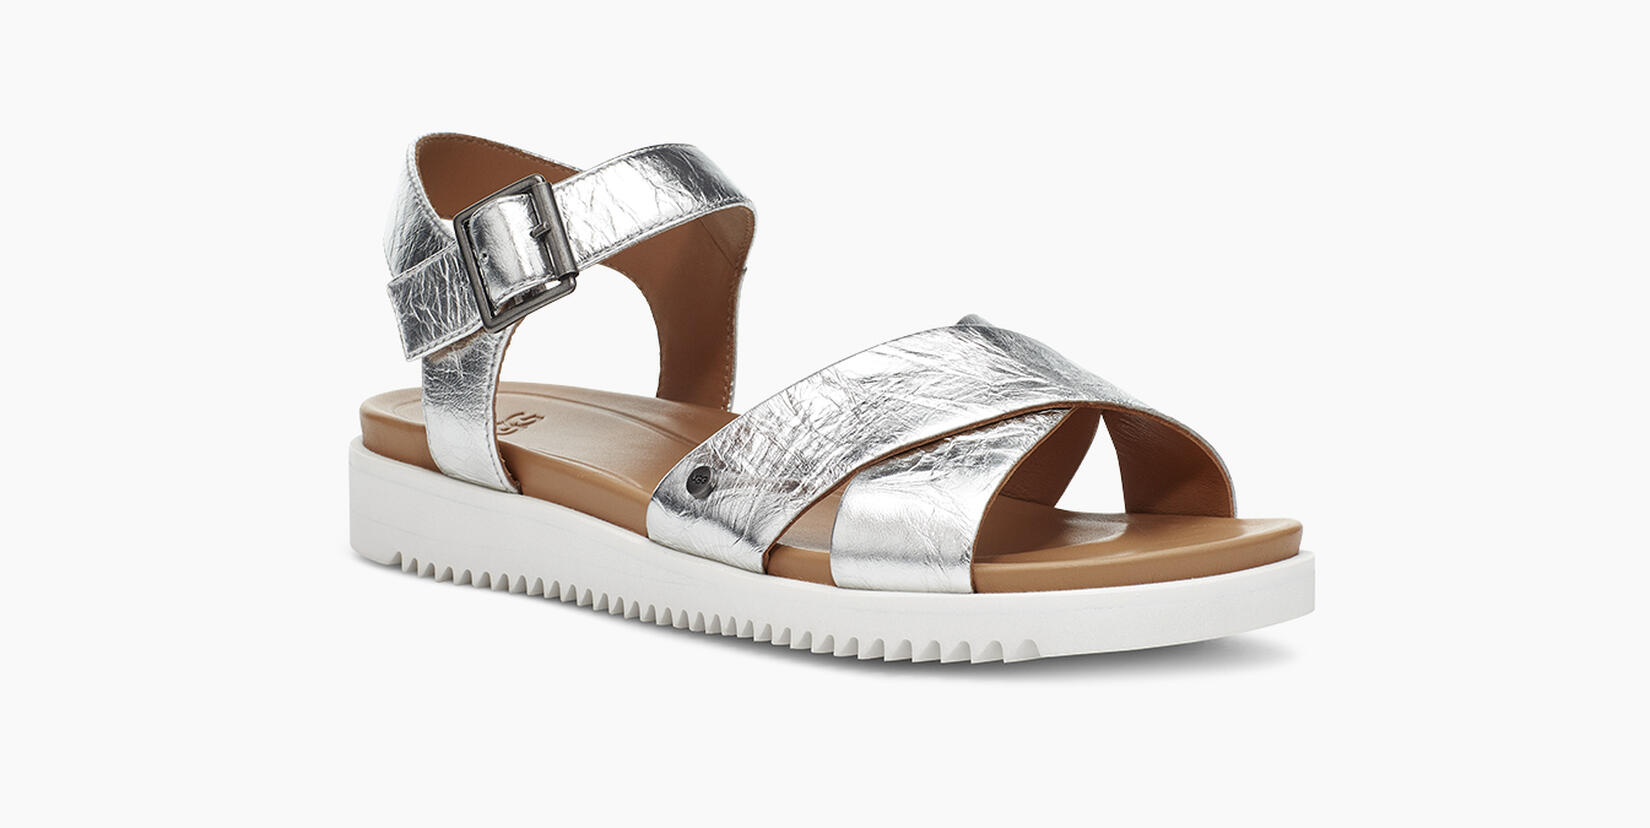 Zoie Metallic Sandal